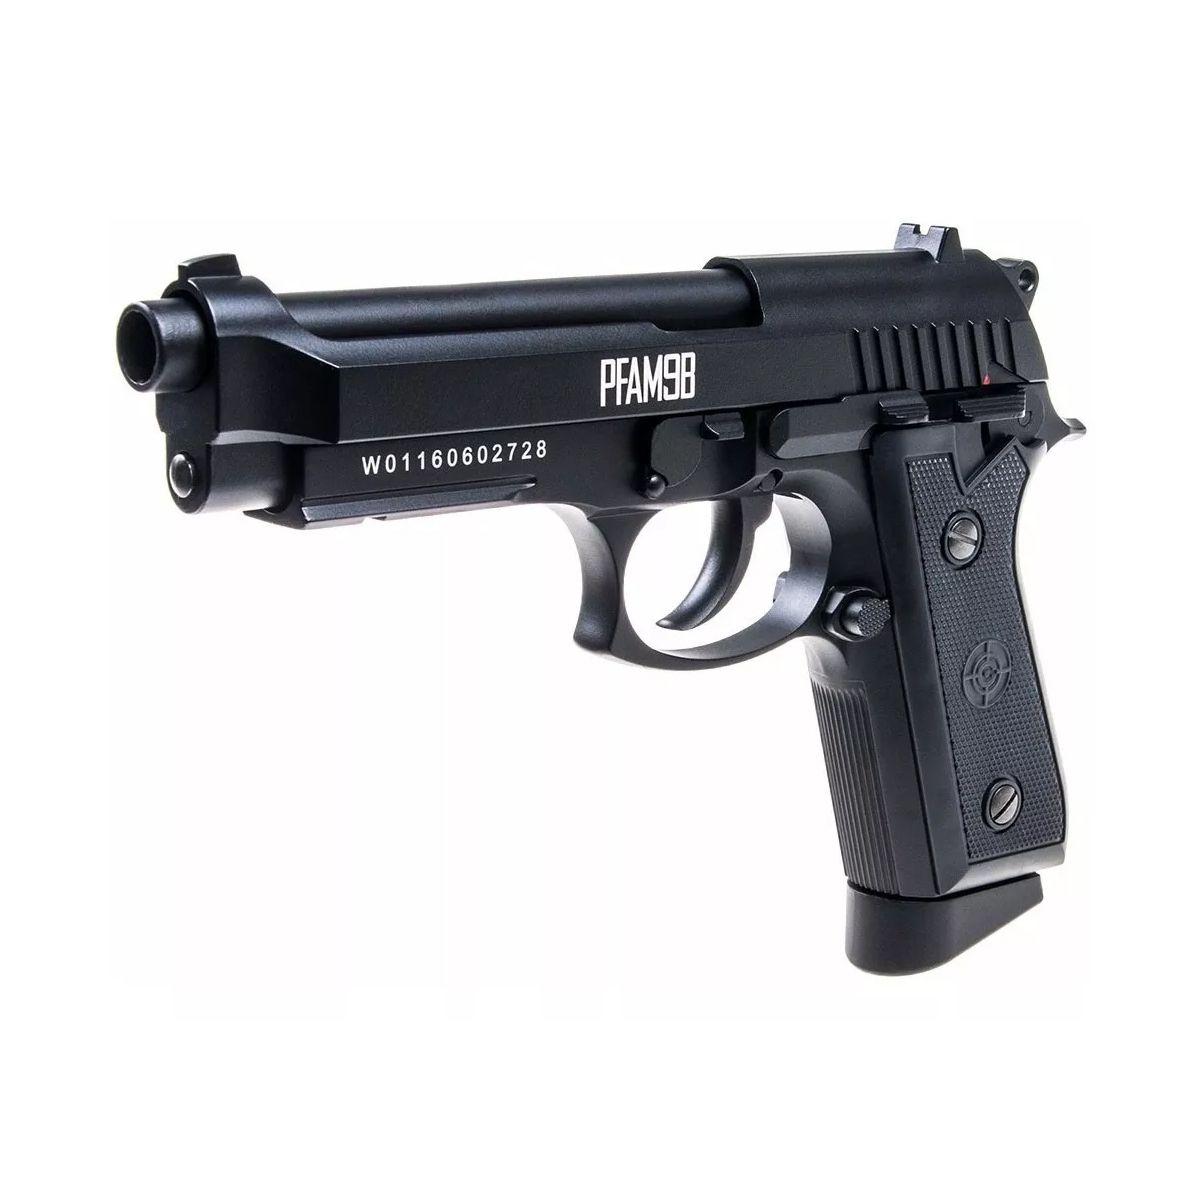 Pistola De Pressão Co2 Crosman PFAM98 Metal Blowback 4.5mm